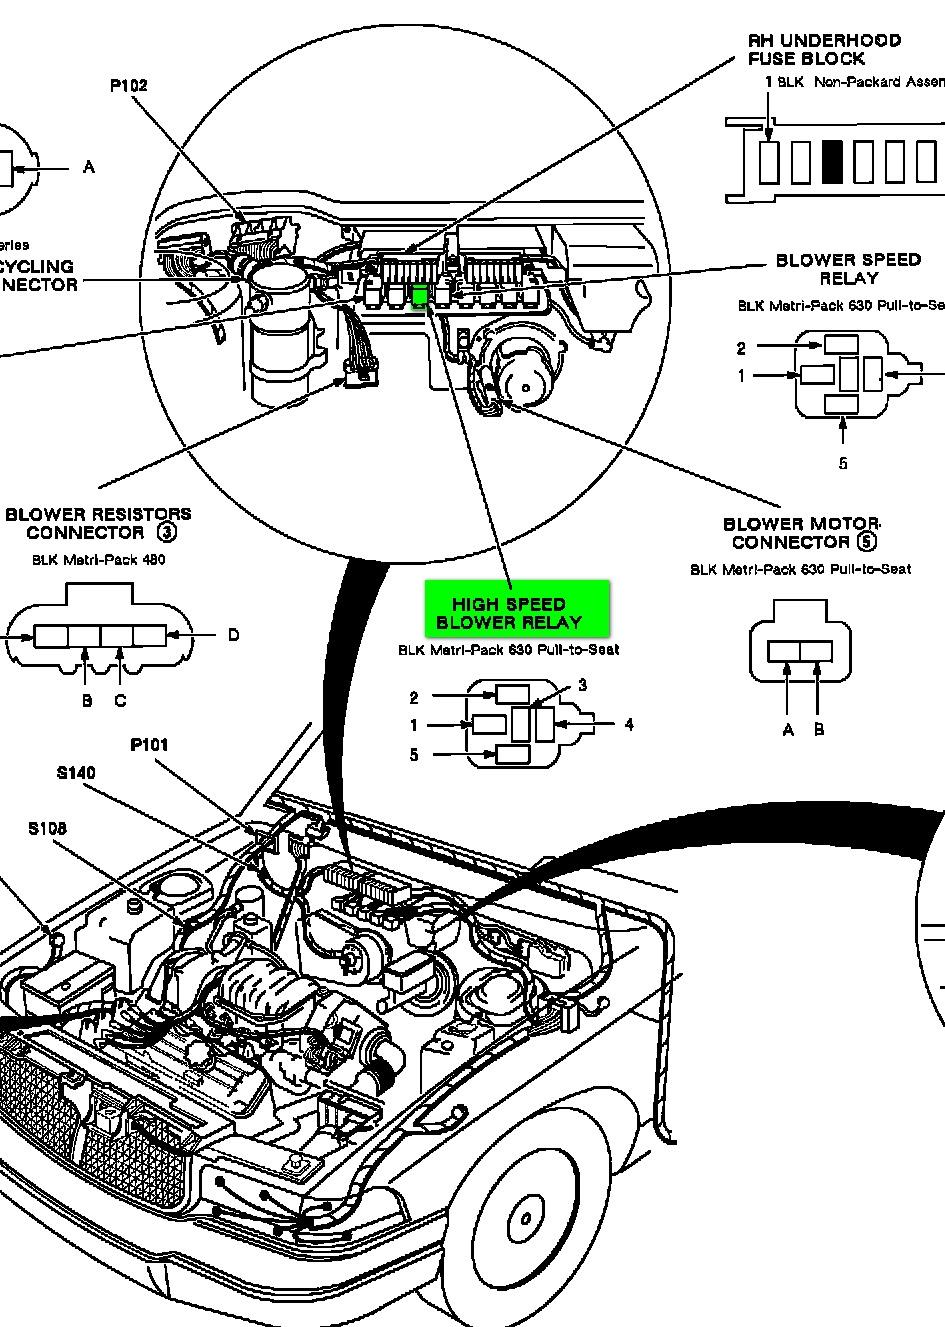 Diagram 1998 Buick Park Avenue Parts Diagram Full Version Hd Quality Parts Diagram Diagramedyep Pcandphone Fr